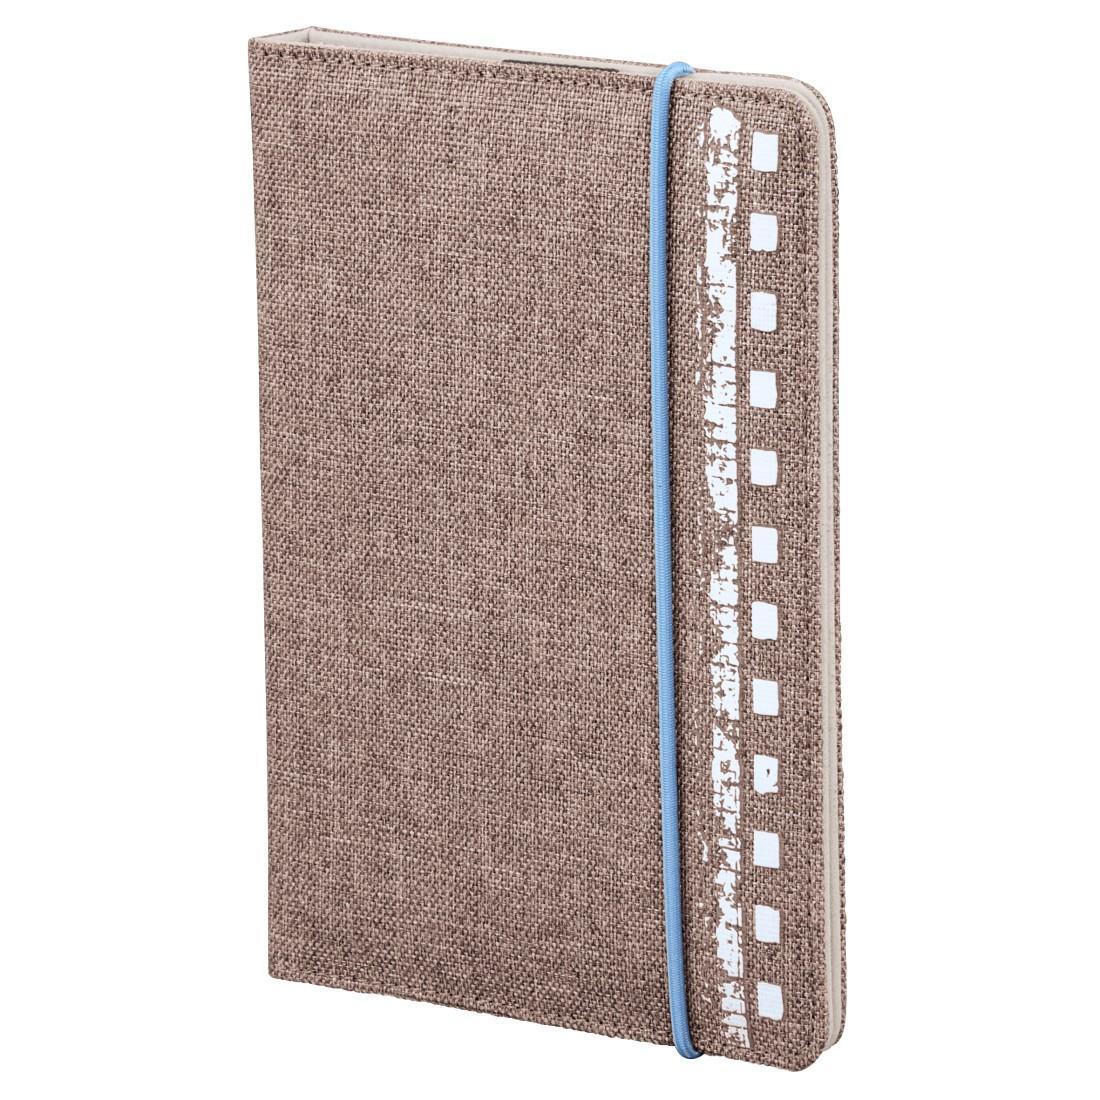 Калъф HAMA Brushstroke за eBook четец, 6 inch, Бежoв